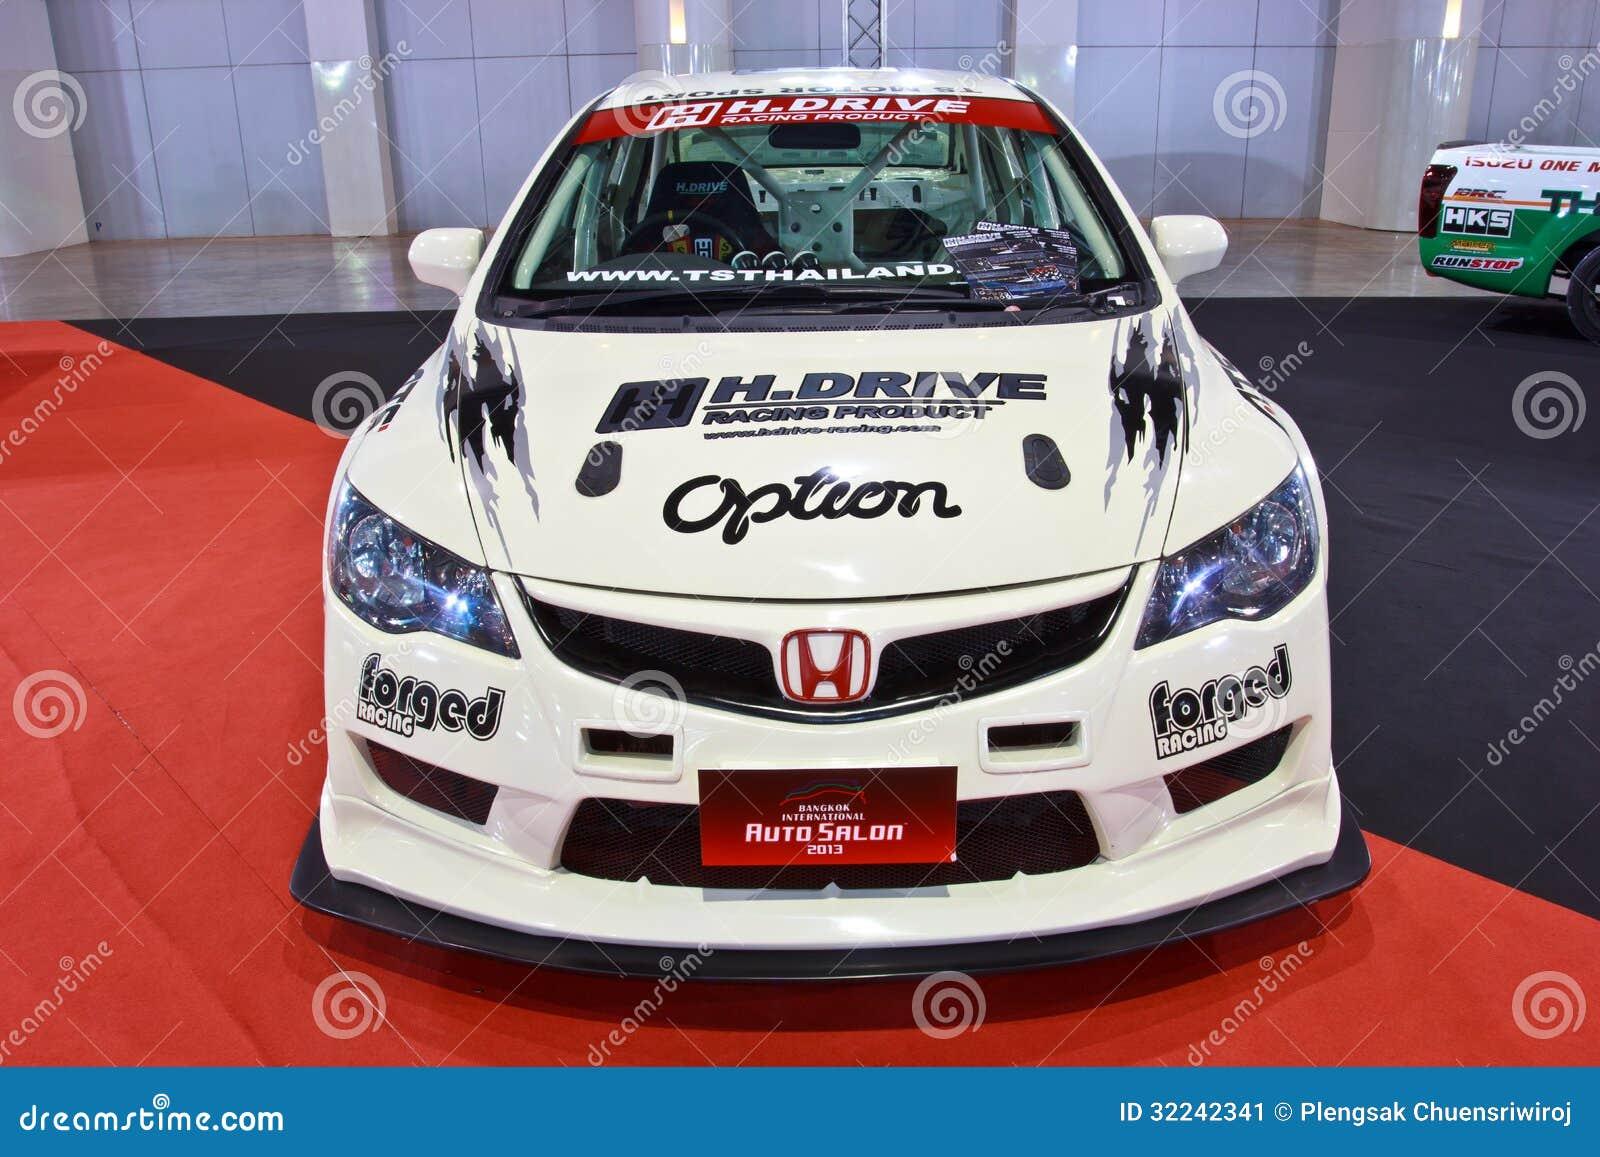 Honda Civic Show At The Second Bangkok International Auto